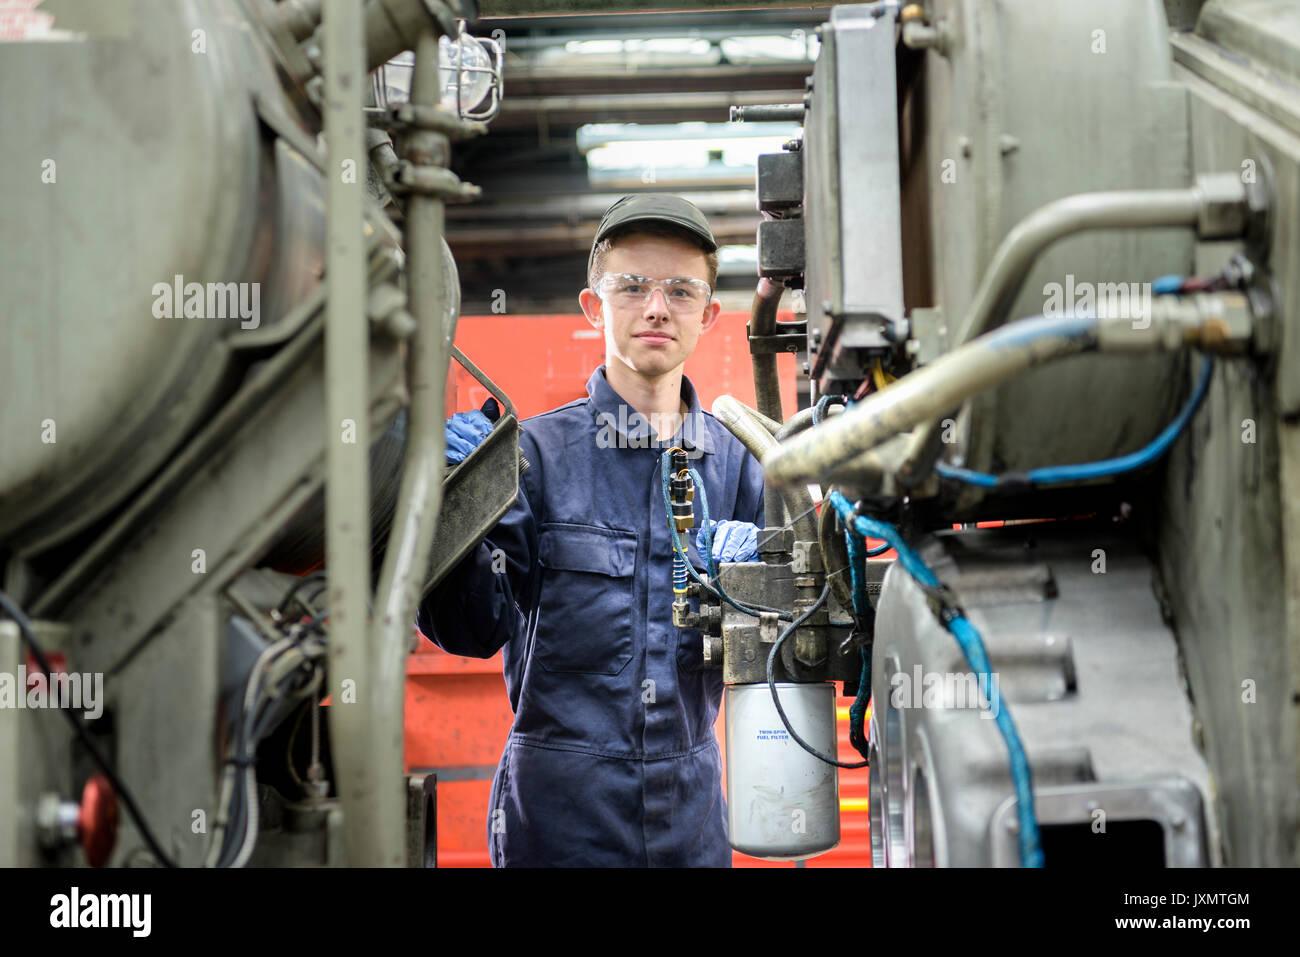 Retrato de joven aprendiz de maquinista de locomotora en obras del tren Imagen De Stock